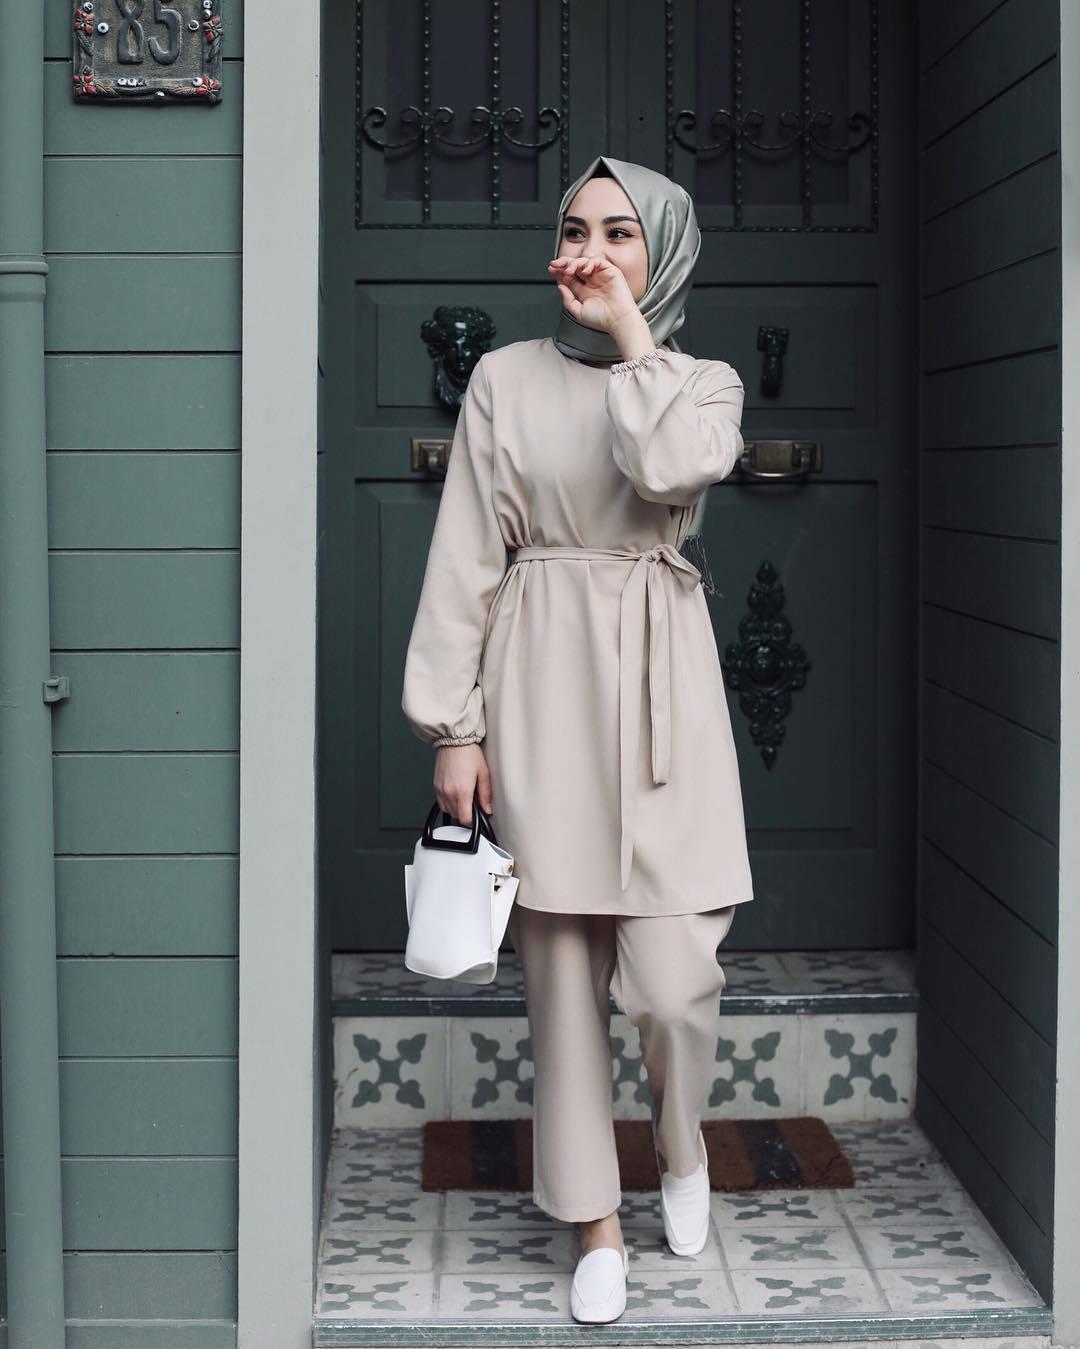 Eid Two piece Muslim Sets Abaya Turkish Tops Pants Vetment Femme Hijab Dress Abayas For Women